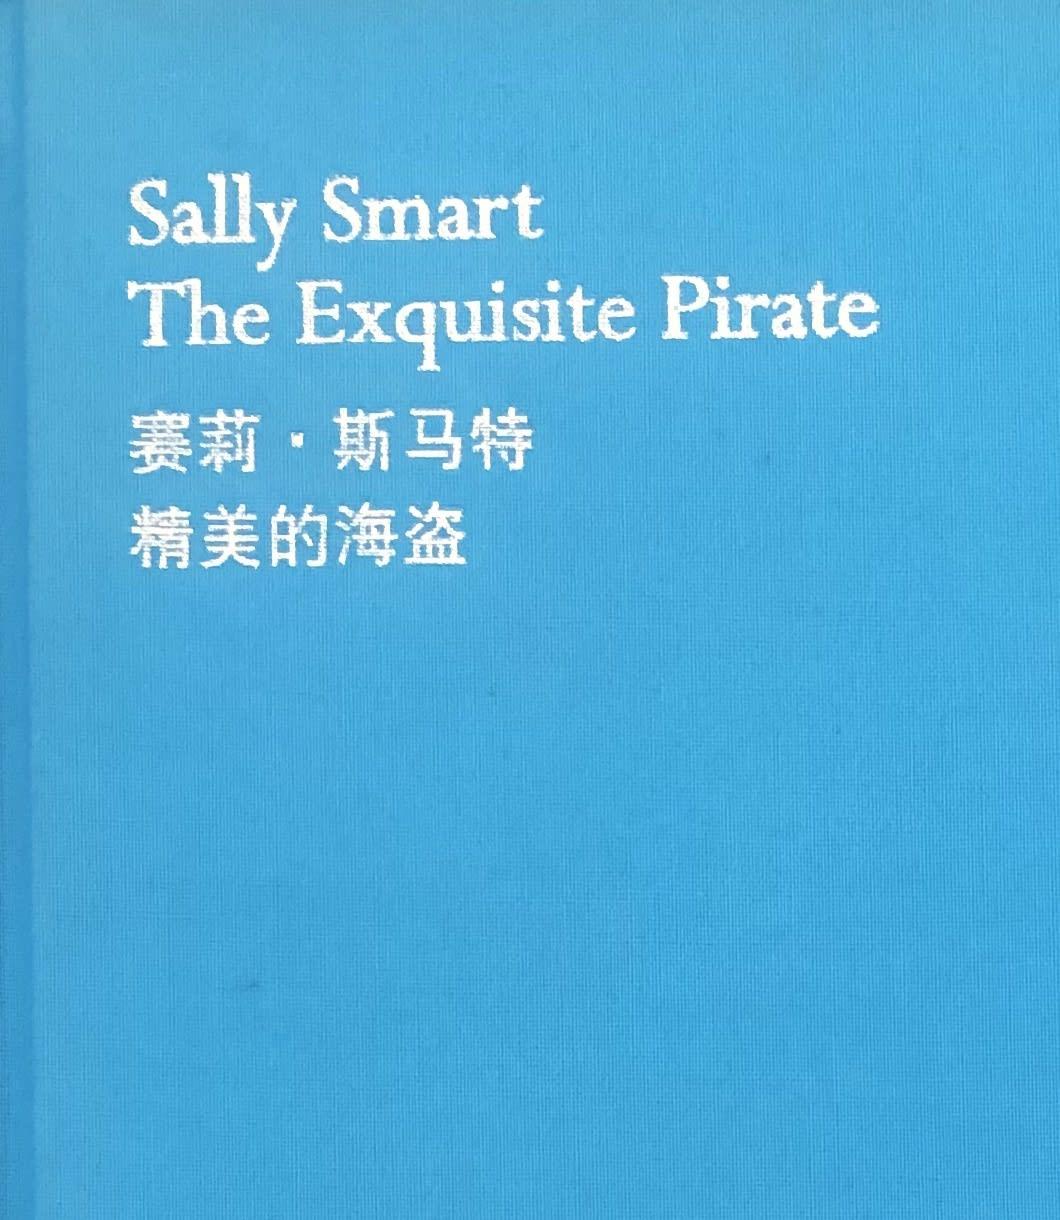 SALLY SMART